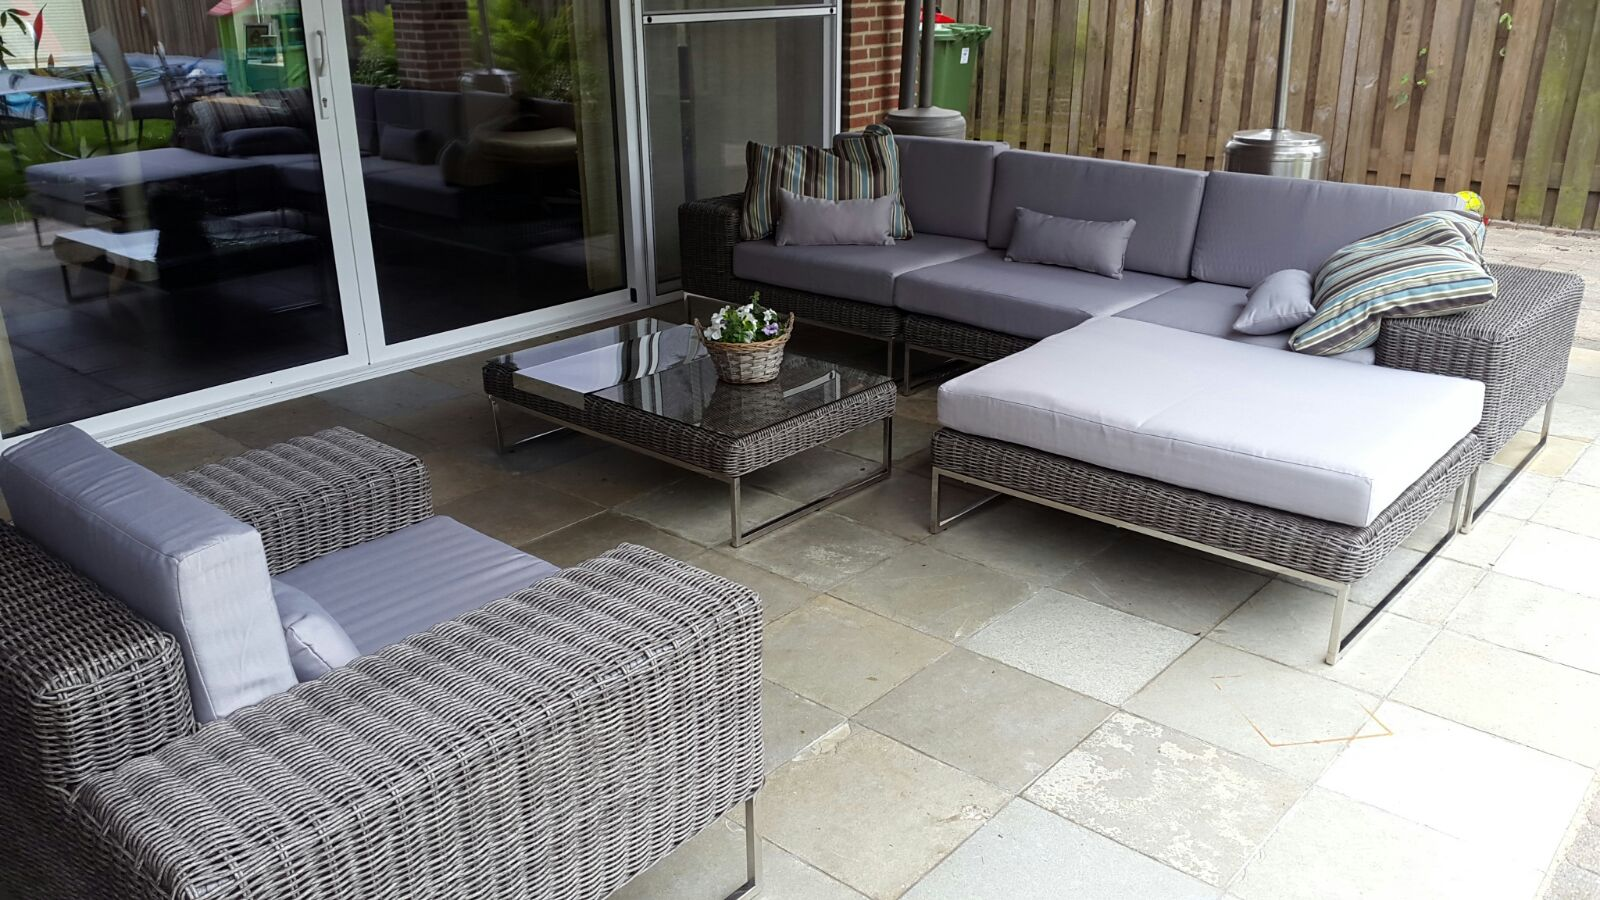 Lounge Bank Tuin : Lounge bank voor balkon arbrini design tuinmeubelen